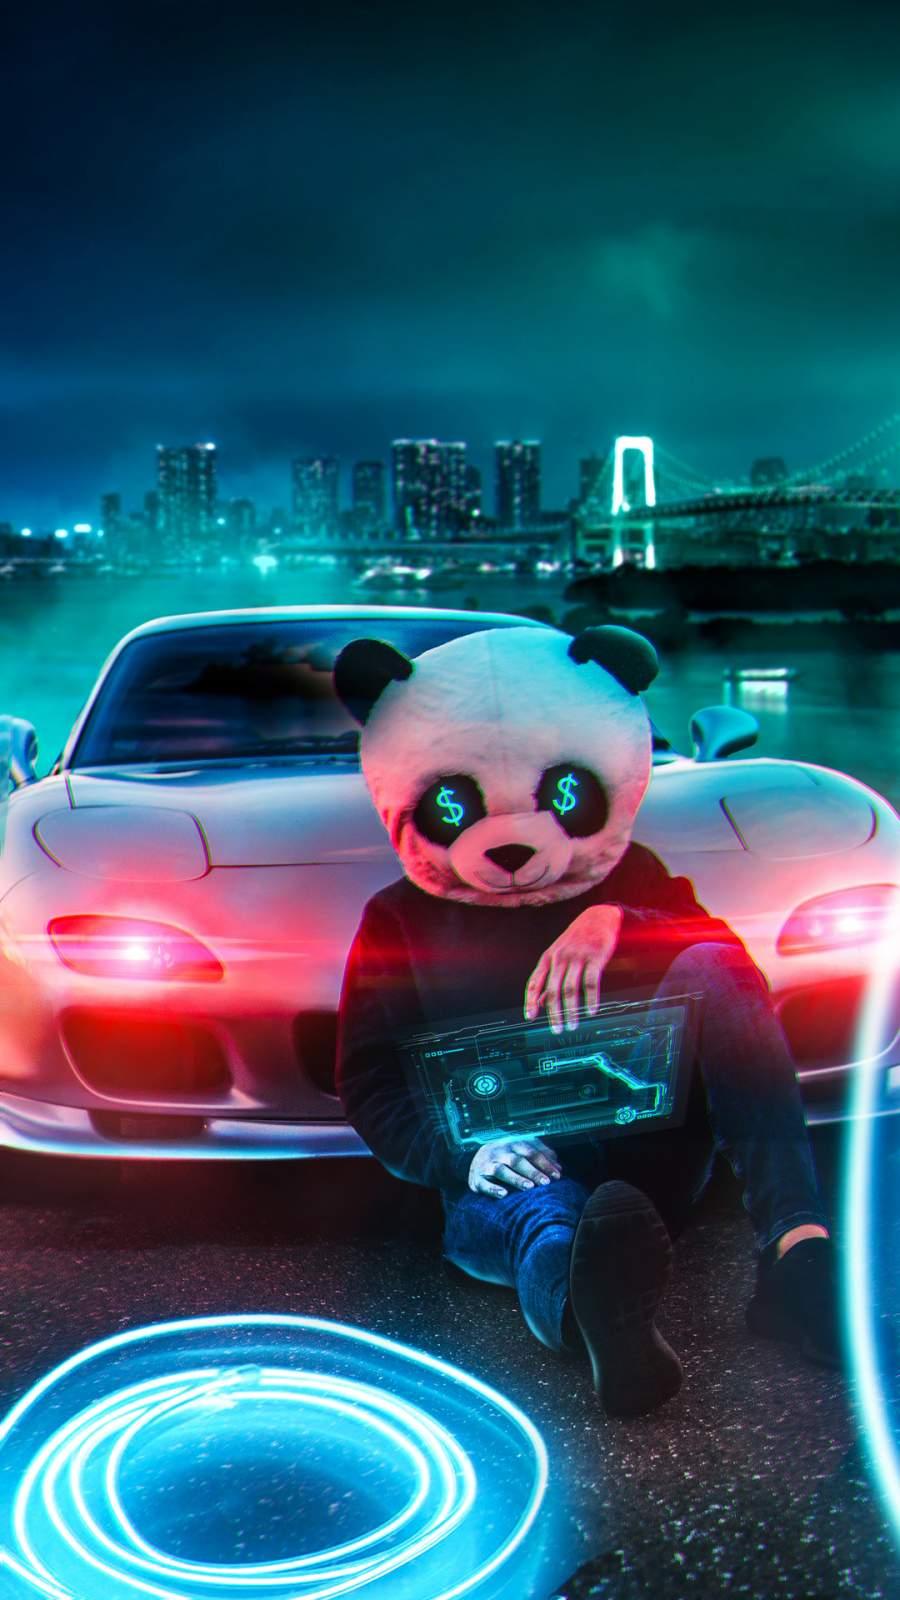 Panda Money iPhone Wallpaper